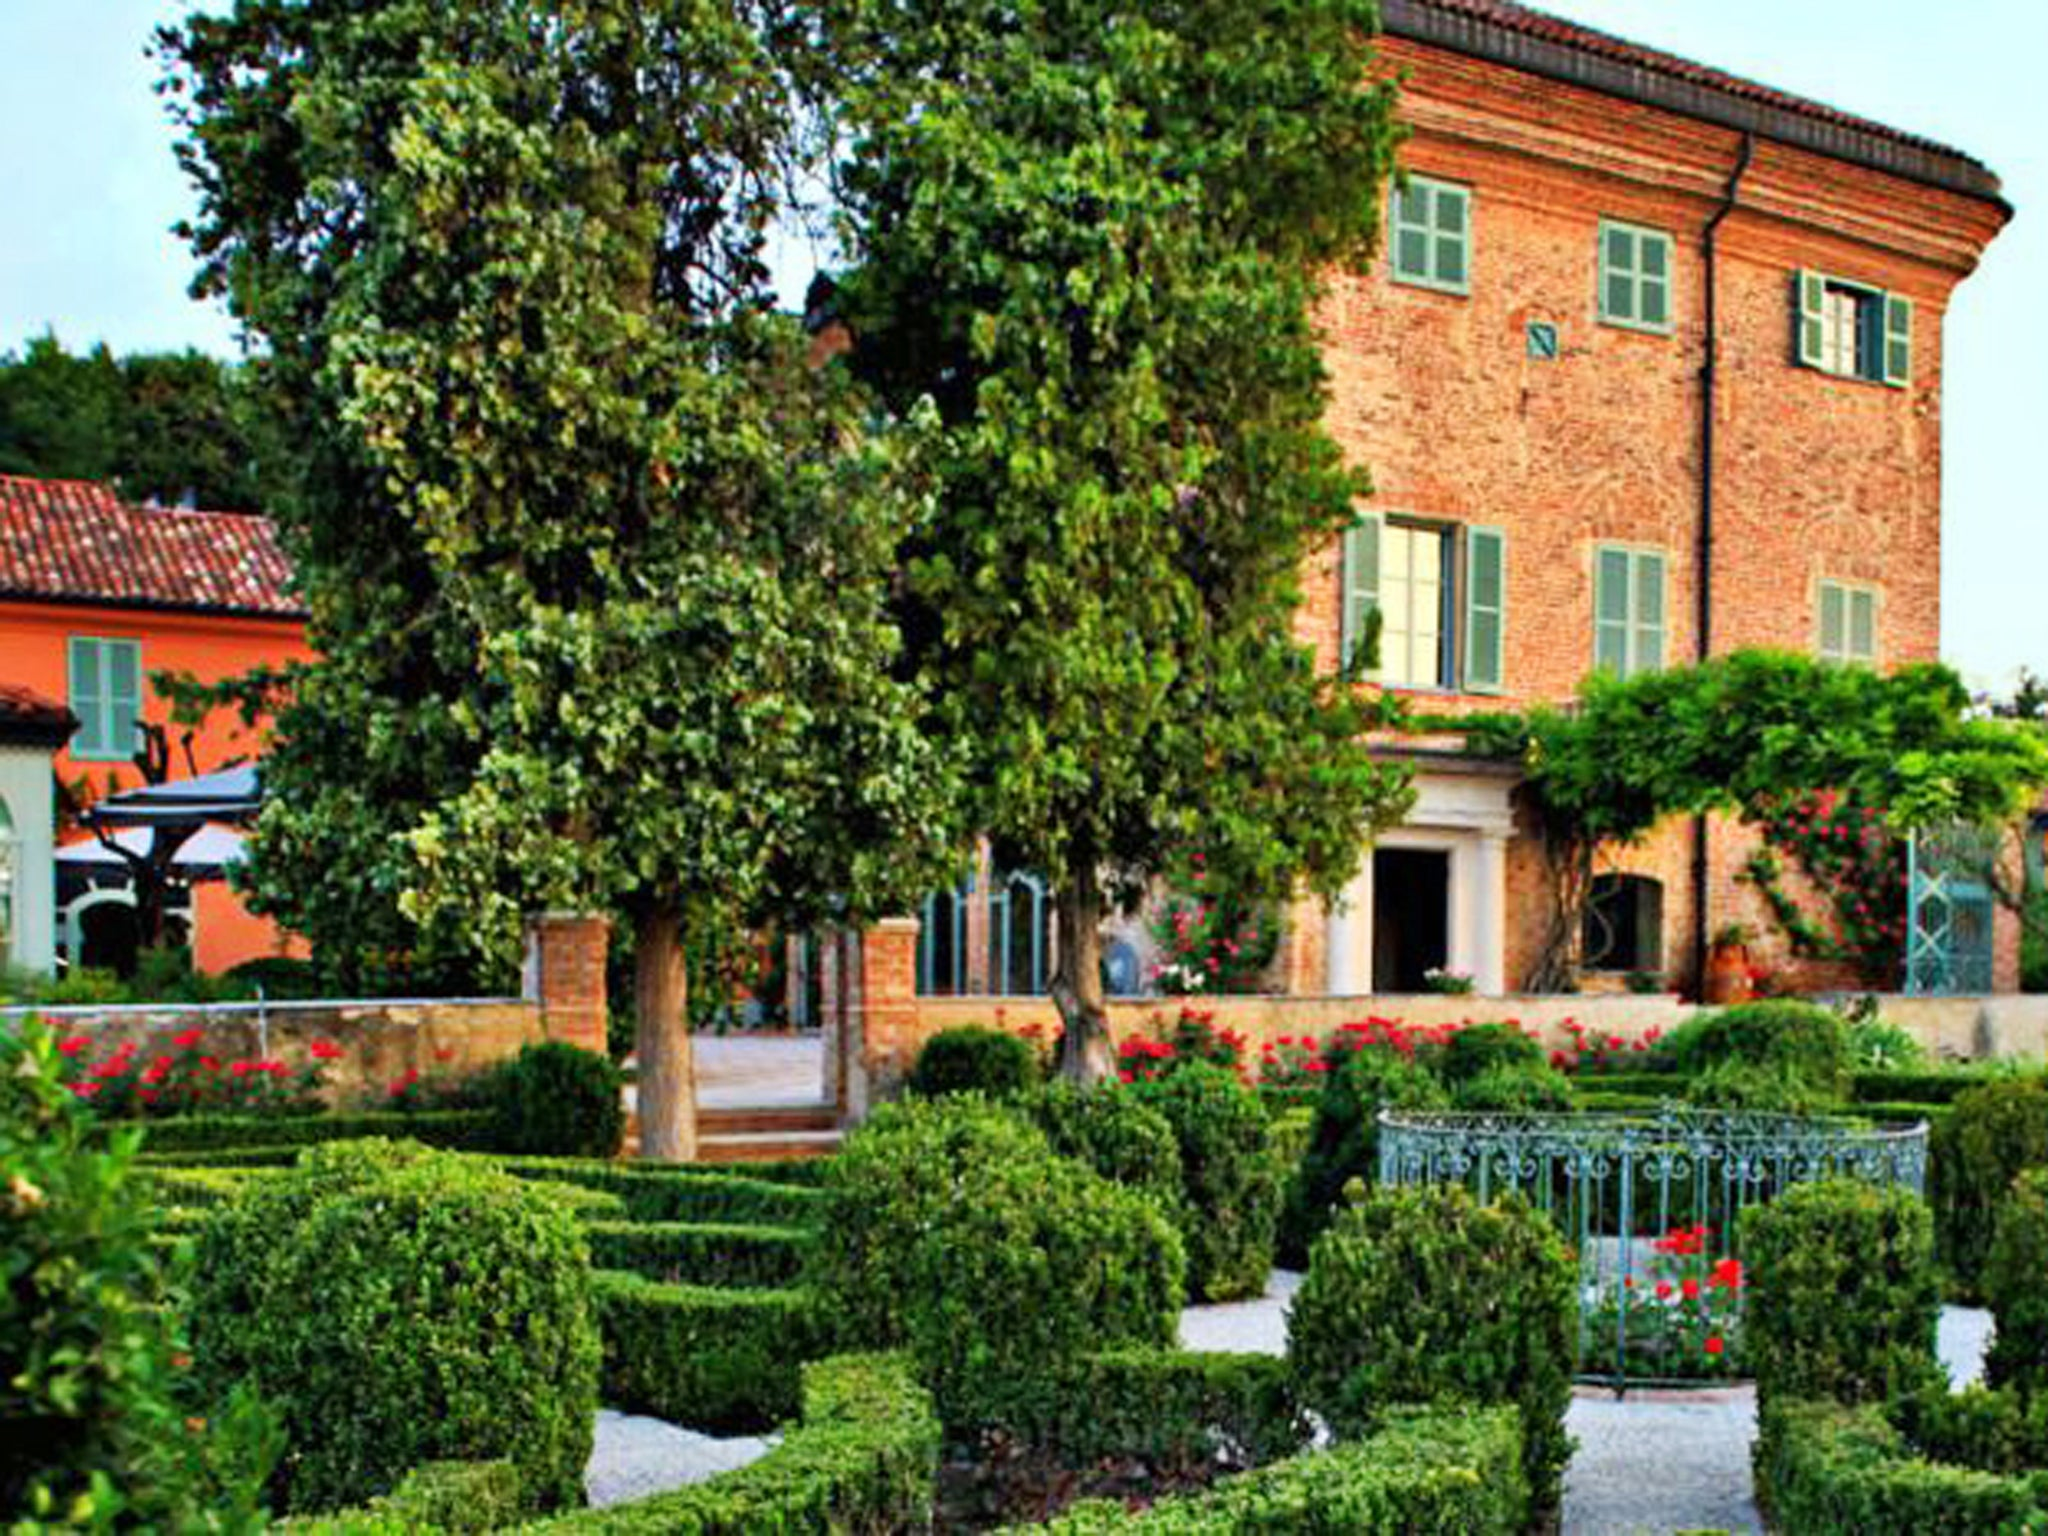 Porta Tv Piemonte.Traveller S Guide Piedmont The Independent